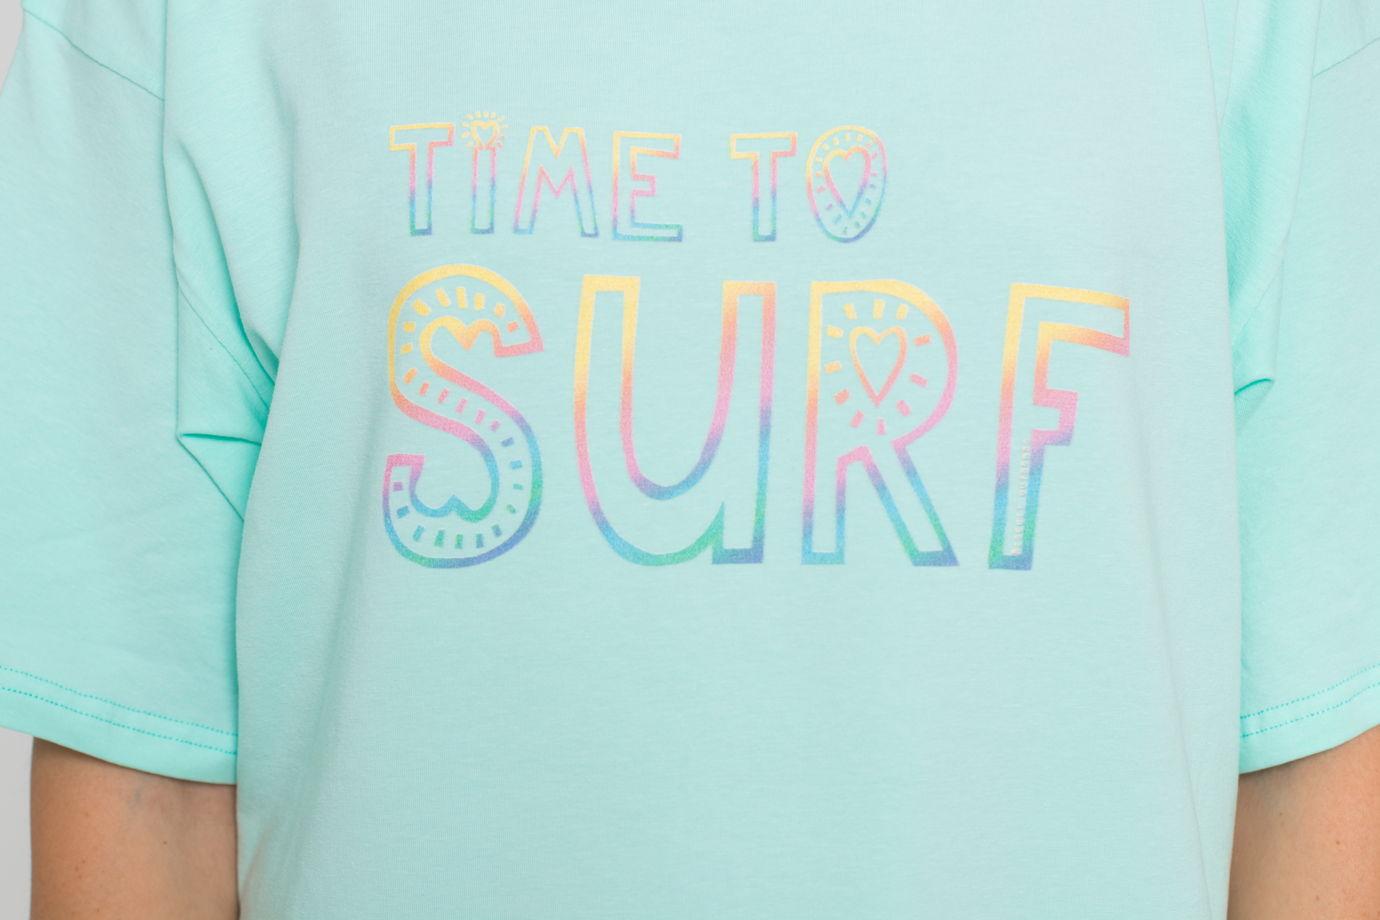 Футболка оверсайз с принтом Time to surf размер L